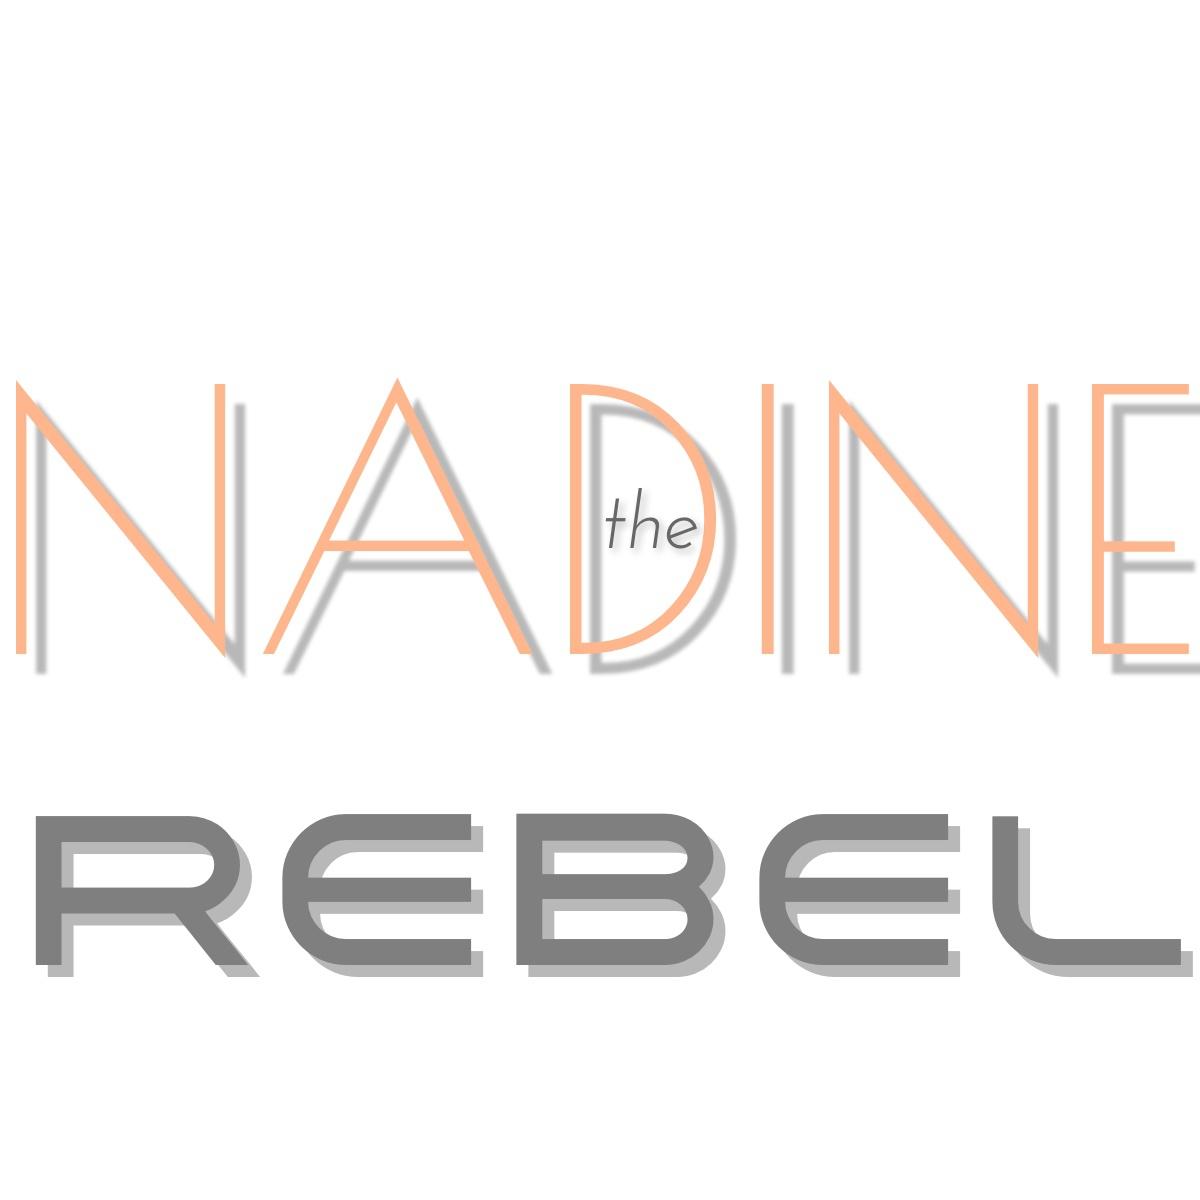 Nadine the rebel